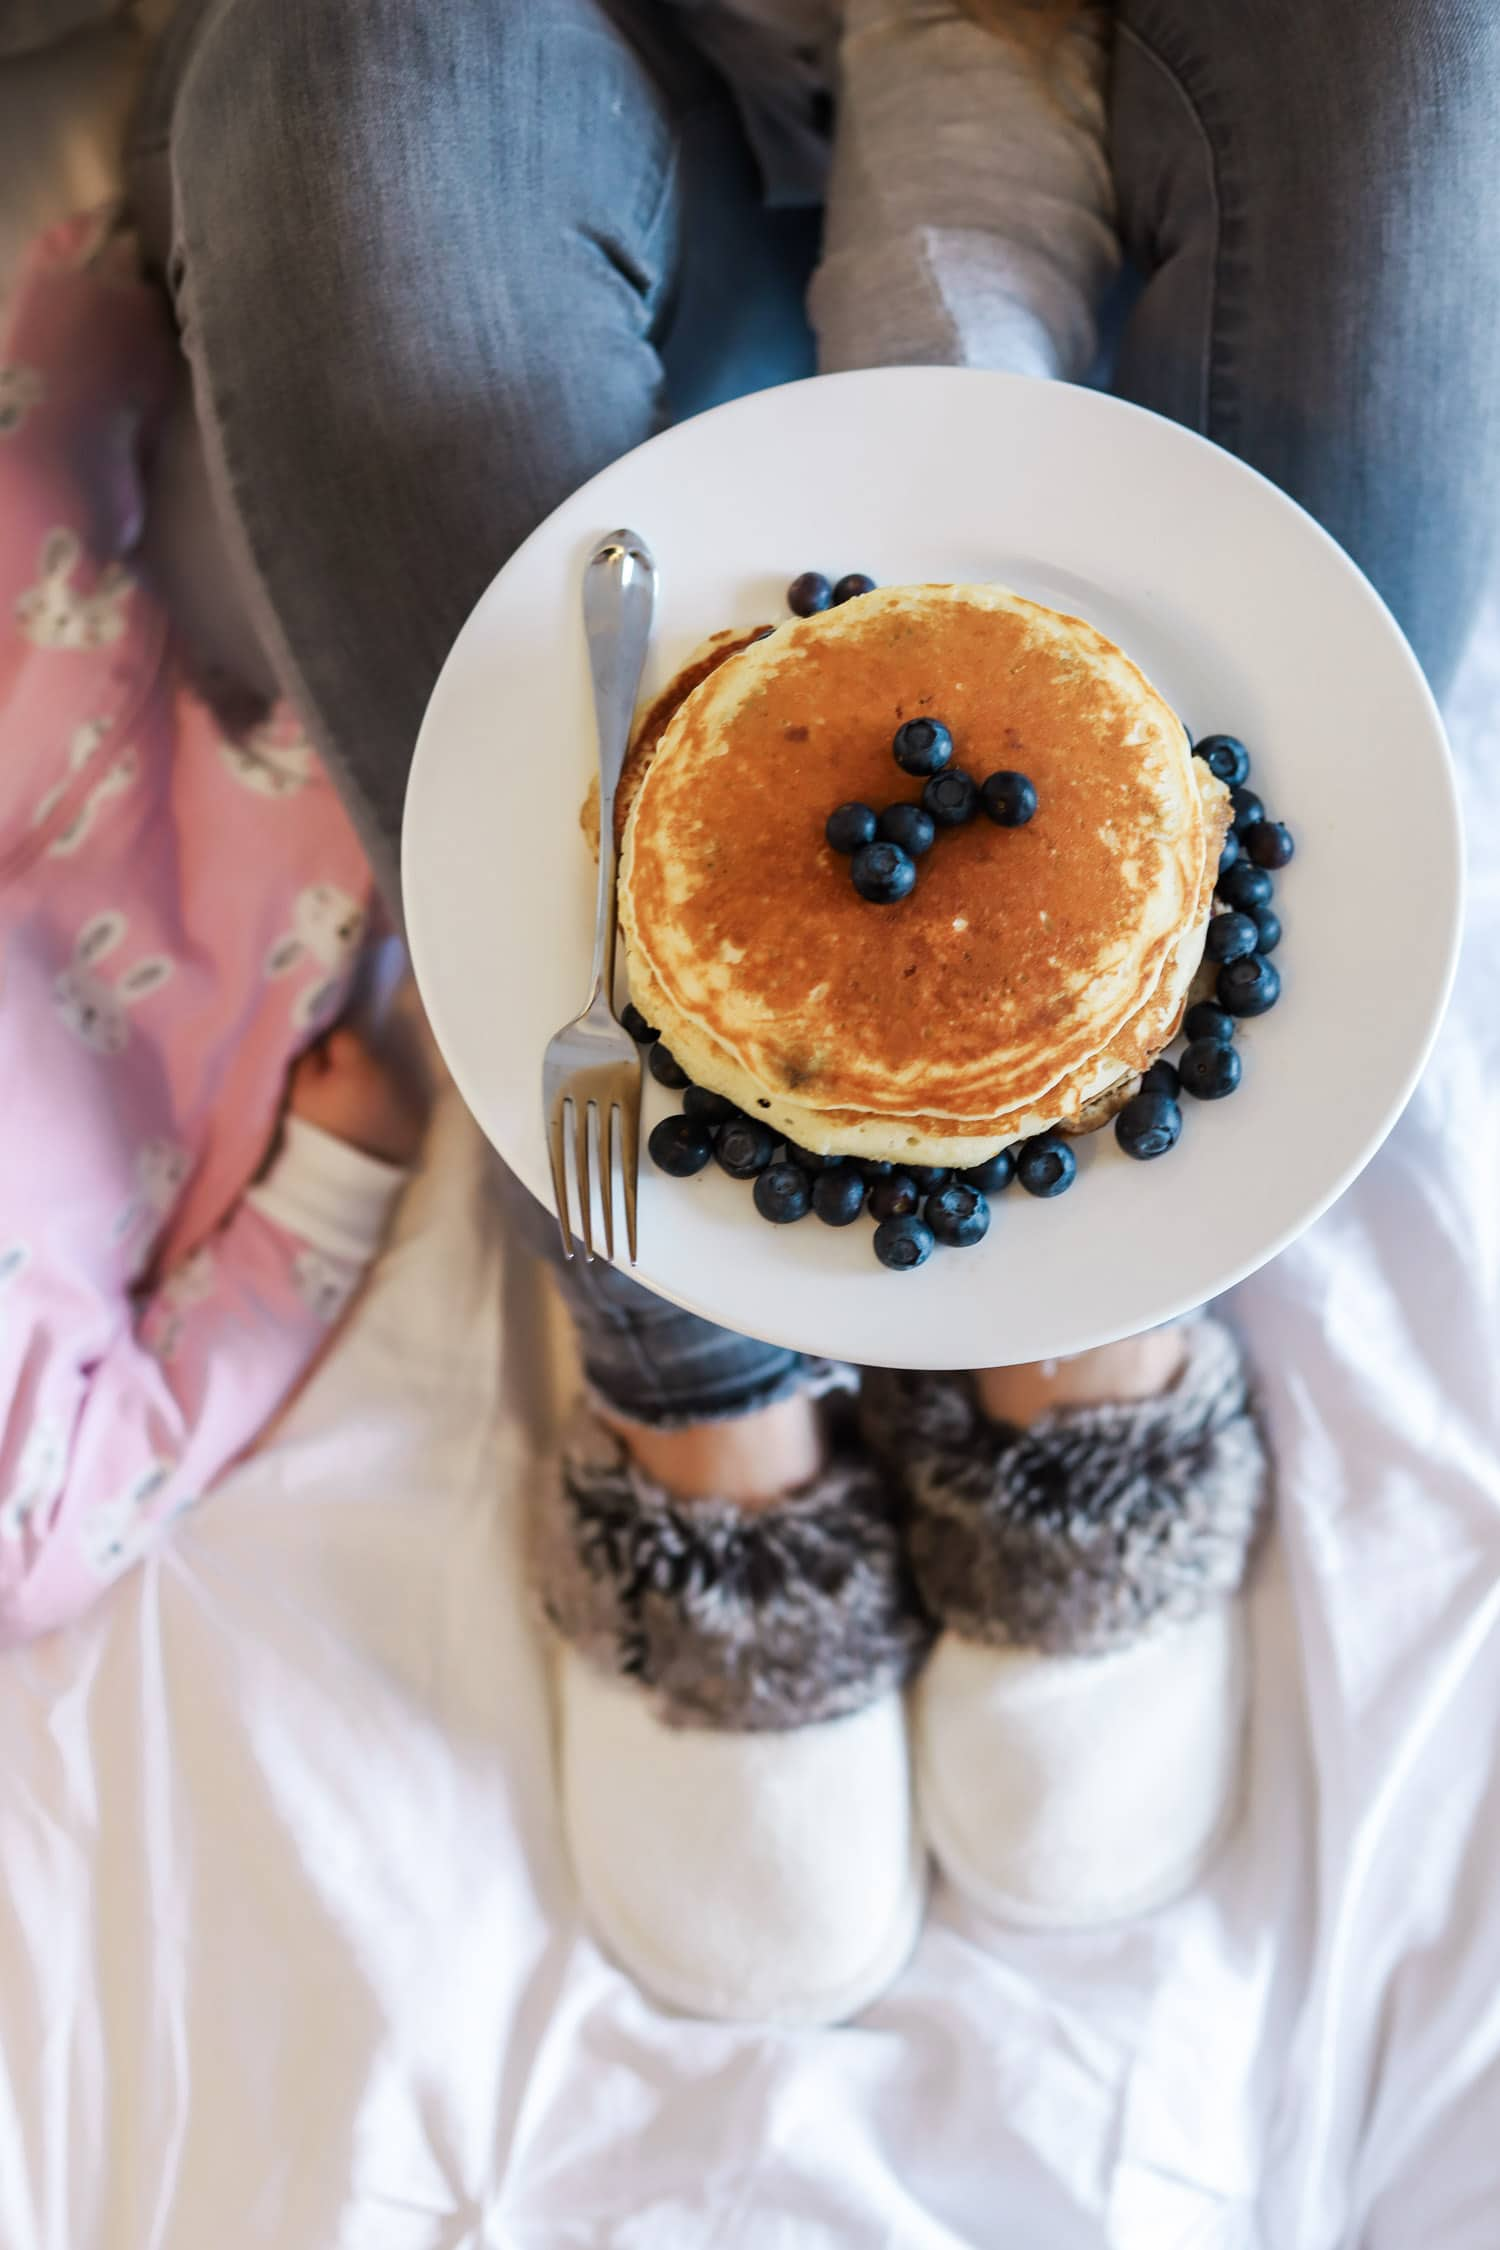 Manage stress around holidays pancake breakfast blueberries   Ashley Brooke Nicholas blogger   fuzzy slippers   cute baby